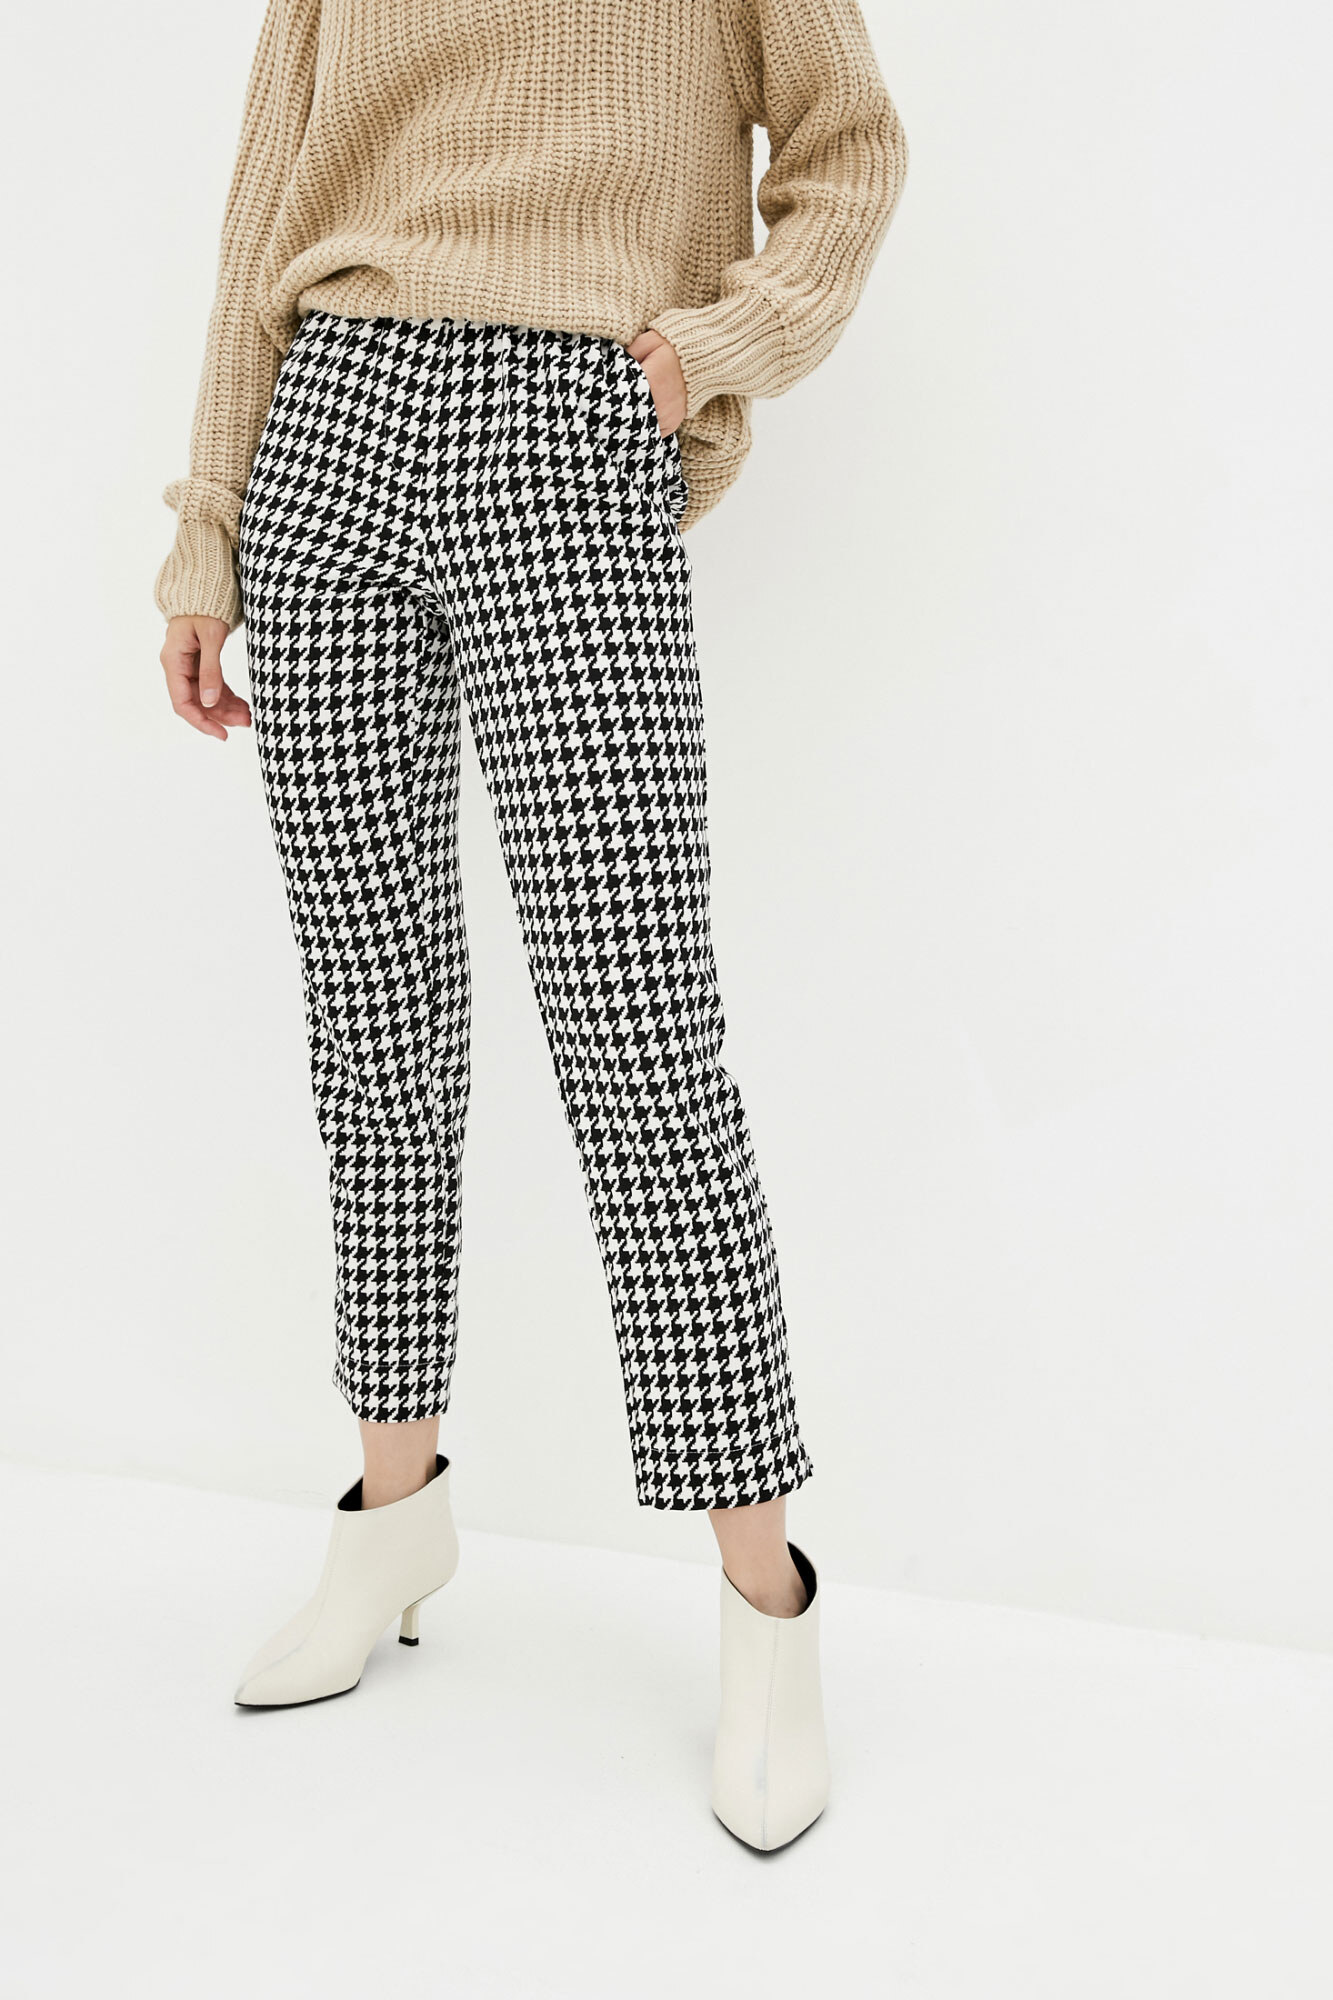 Короткие клетчатые брюки в стиле кэжуал